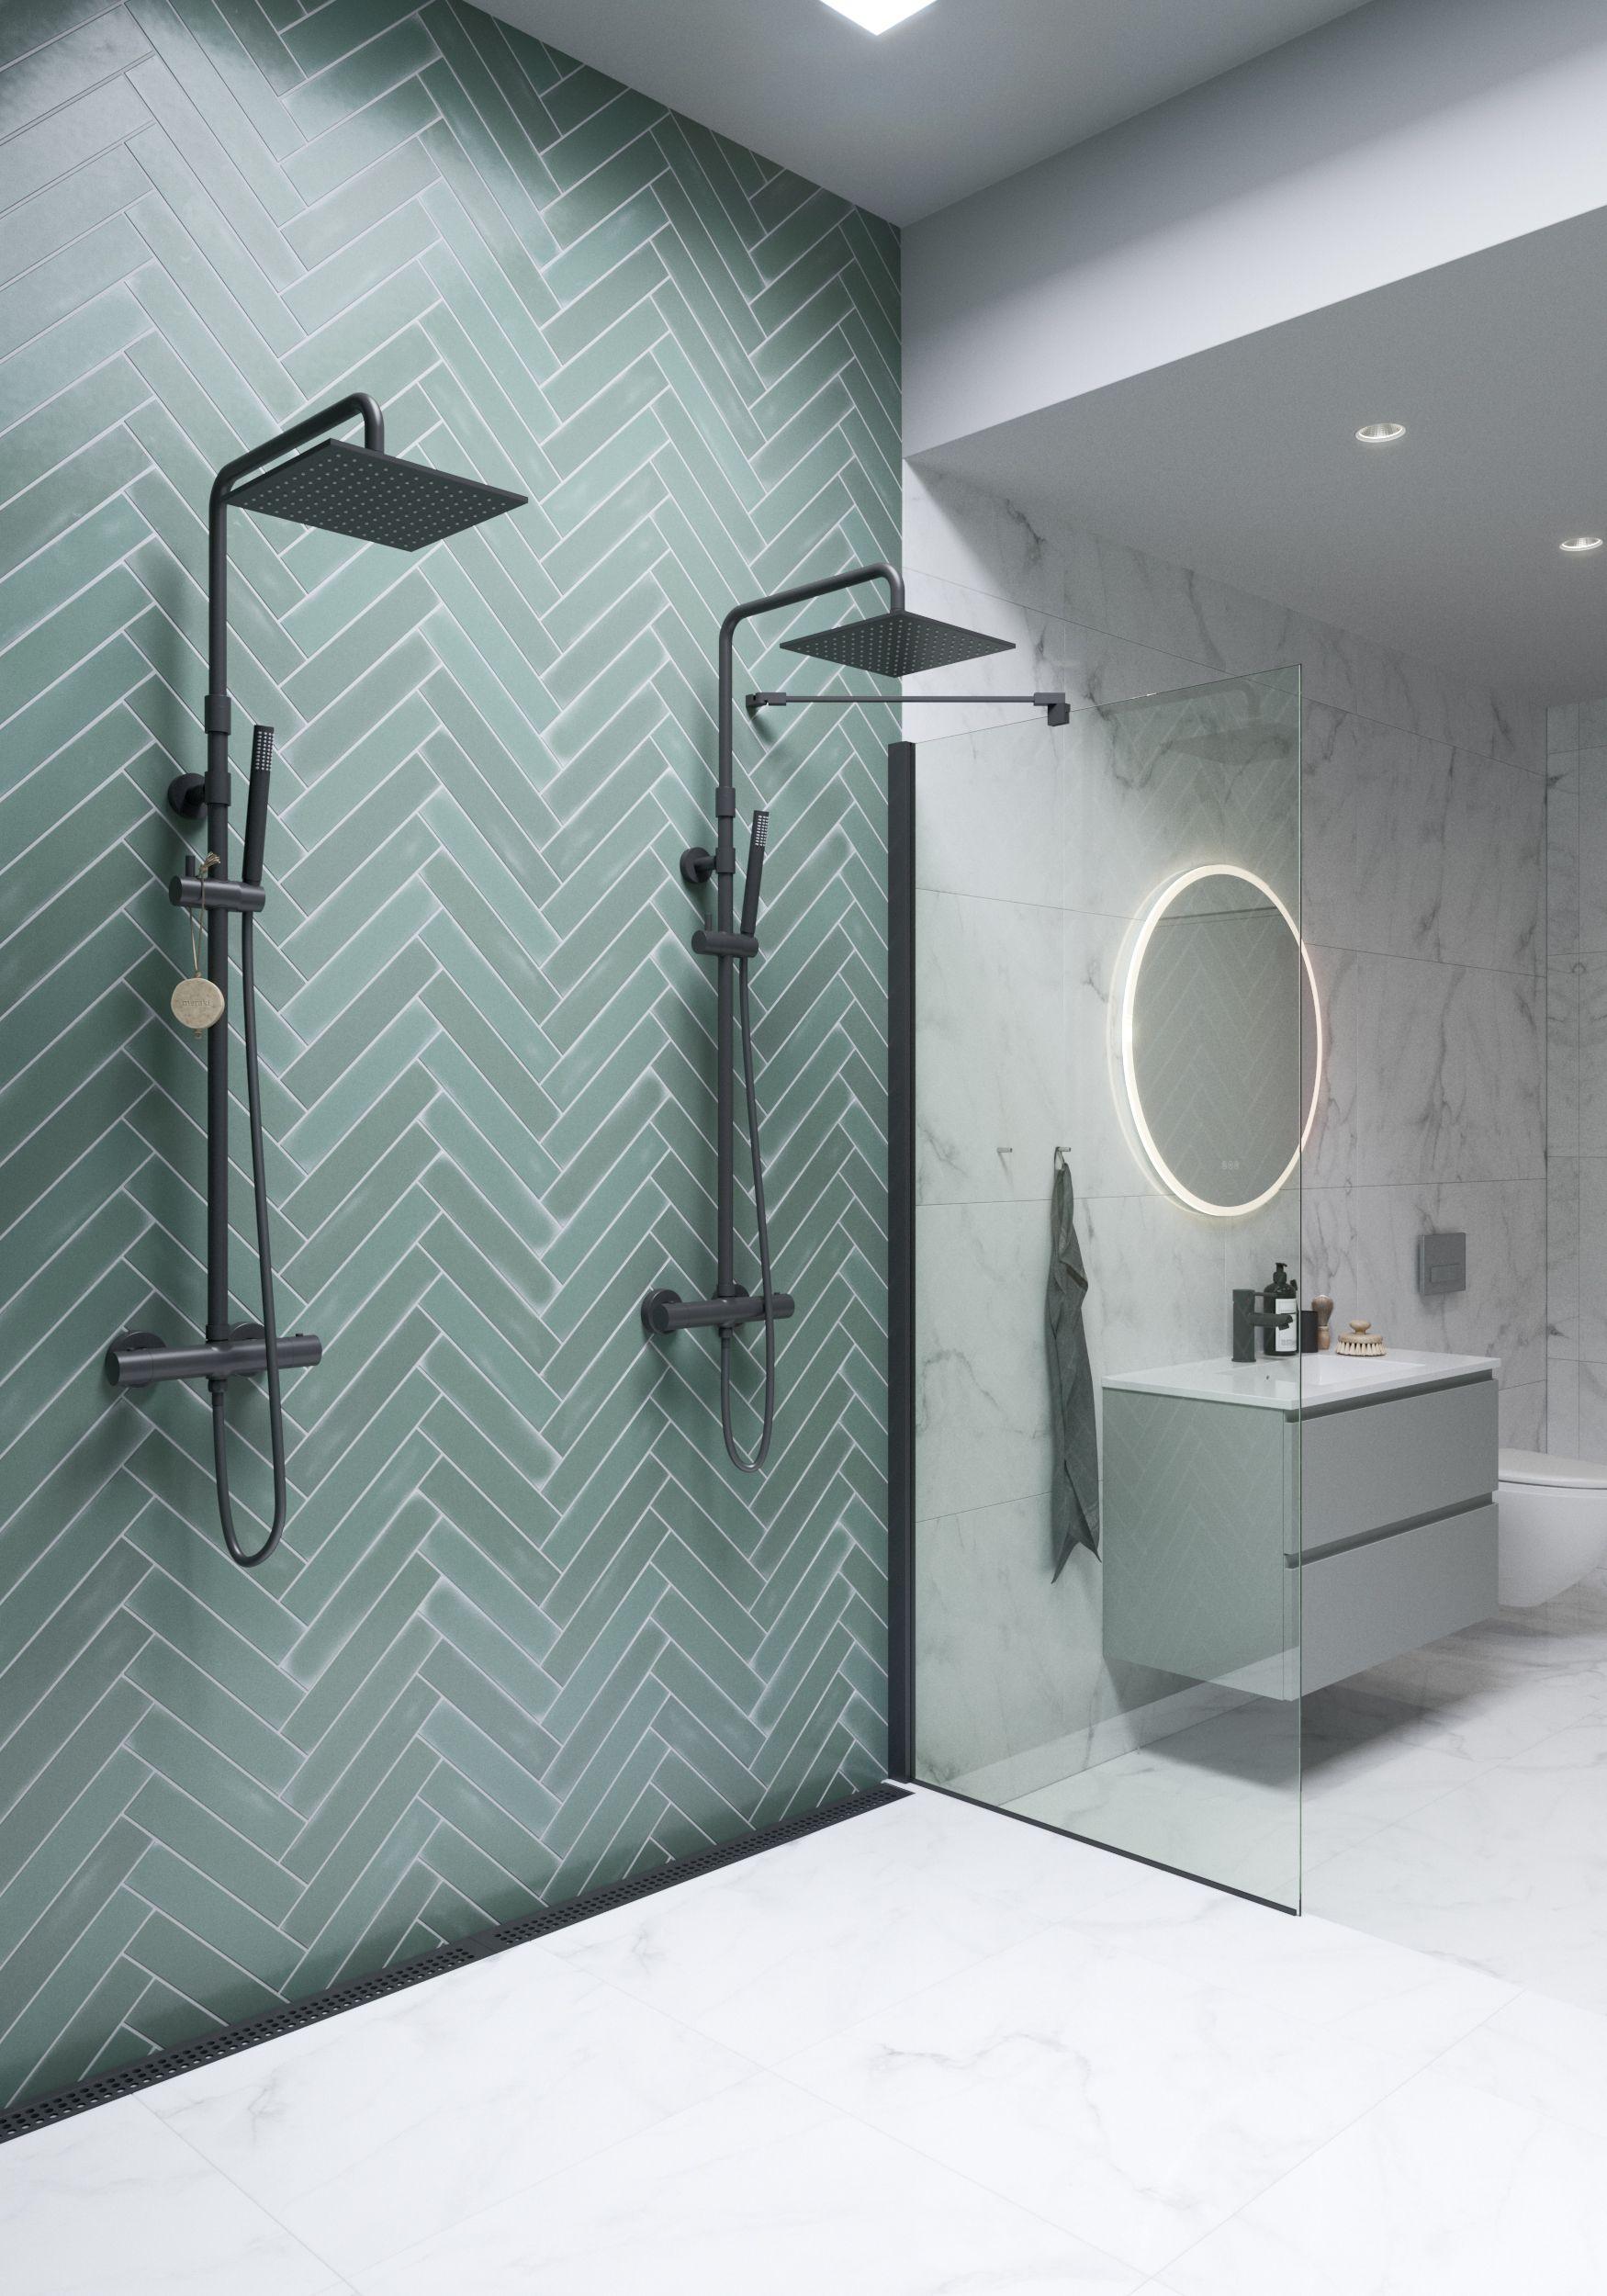 Double Shower Green Herringbone Tile Pattern Bathroom Interior Design Bathroom Remodel Shower Bathroom Style Newest small bathroom herringbone